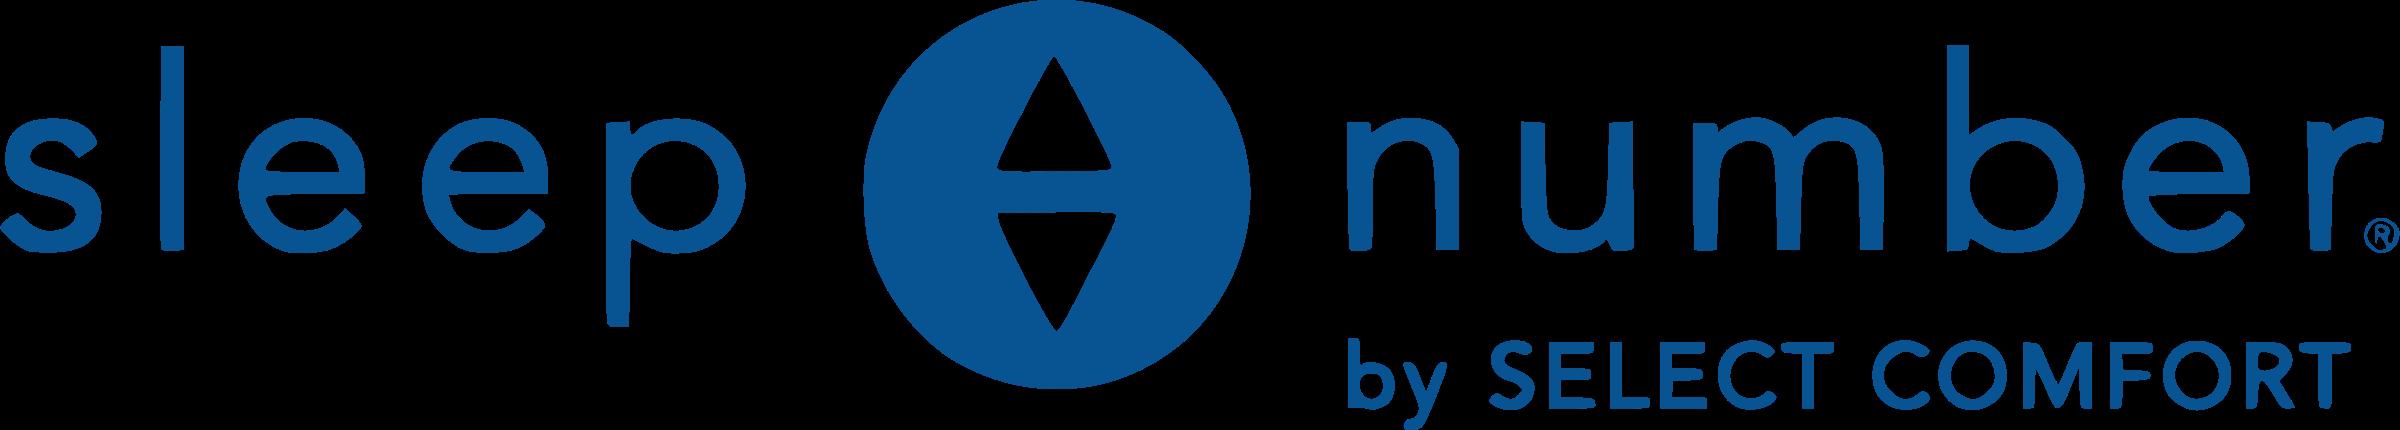 Sleep Number Logo Transparent & PNG Clipart Free Download.